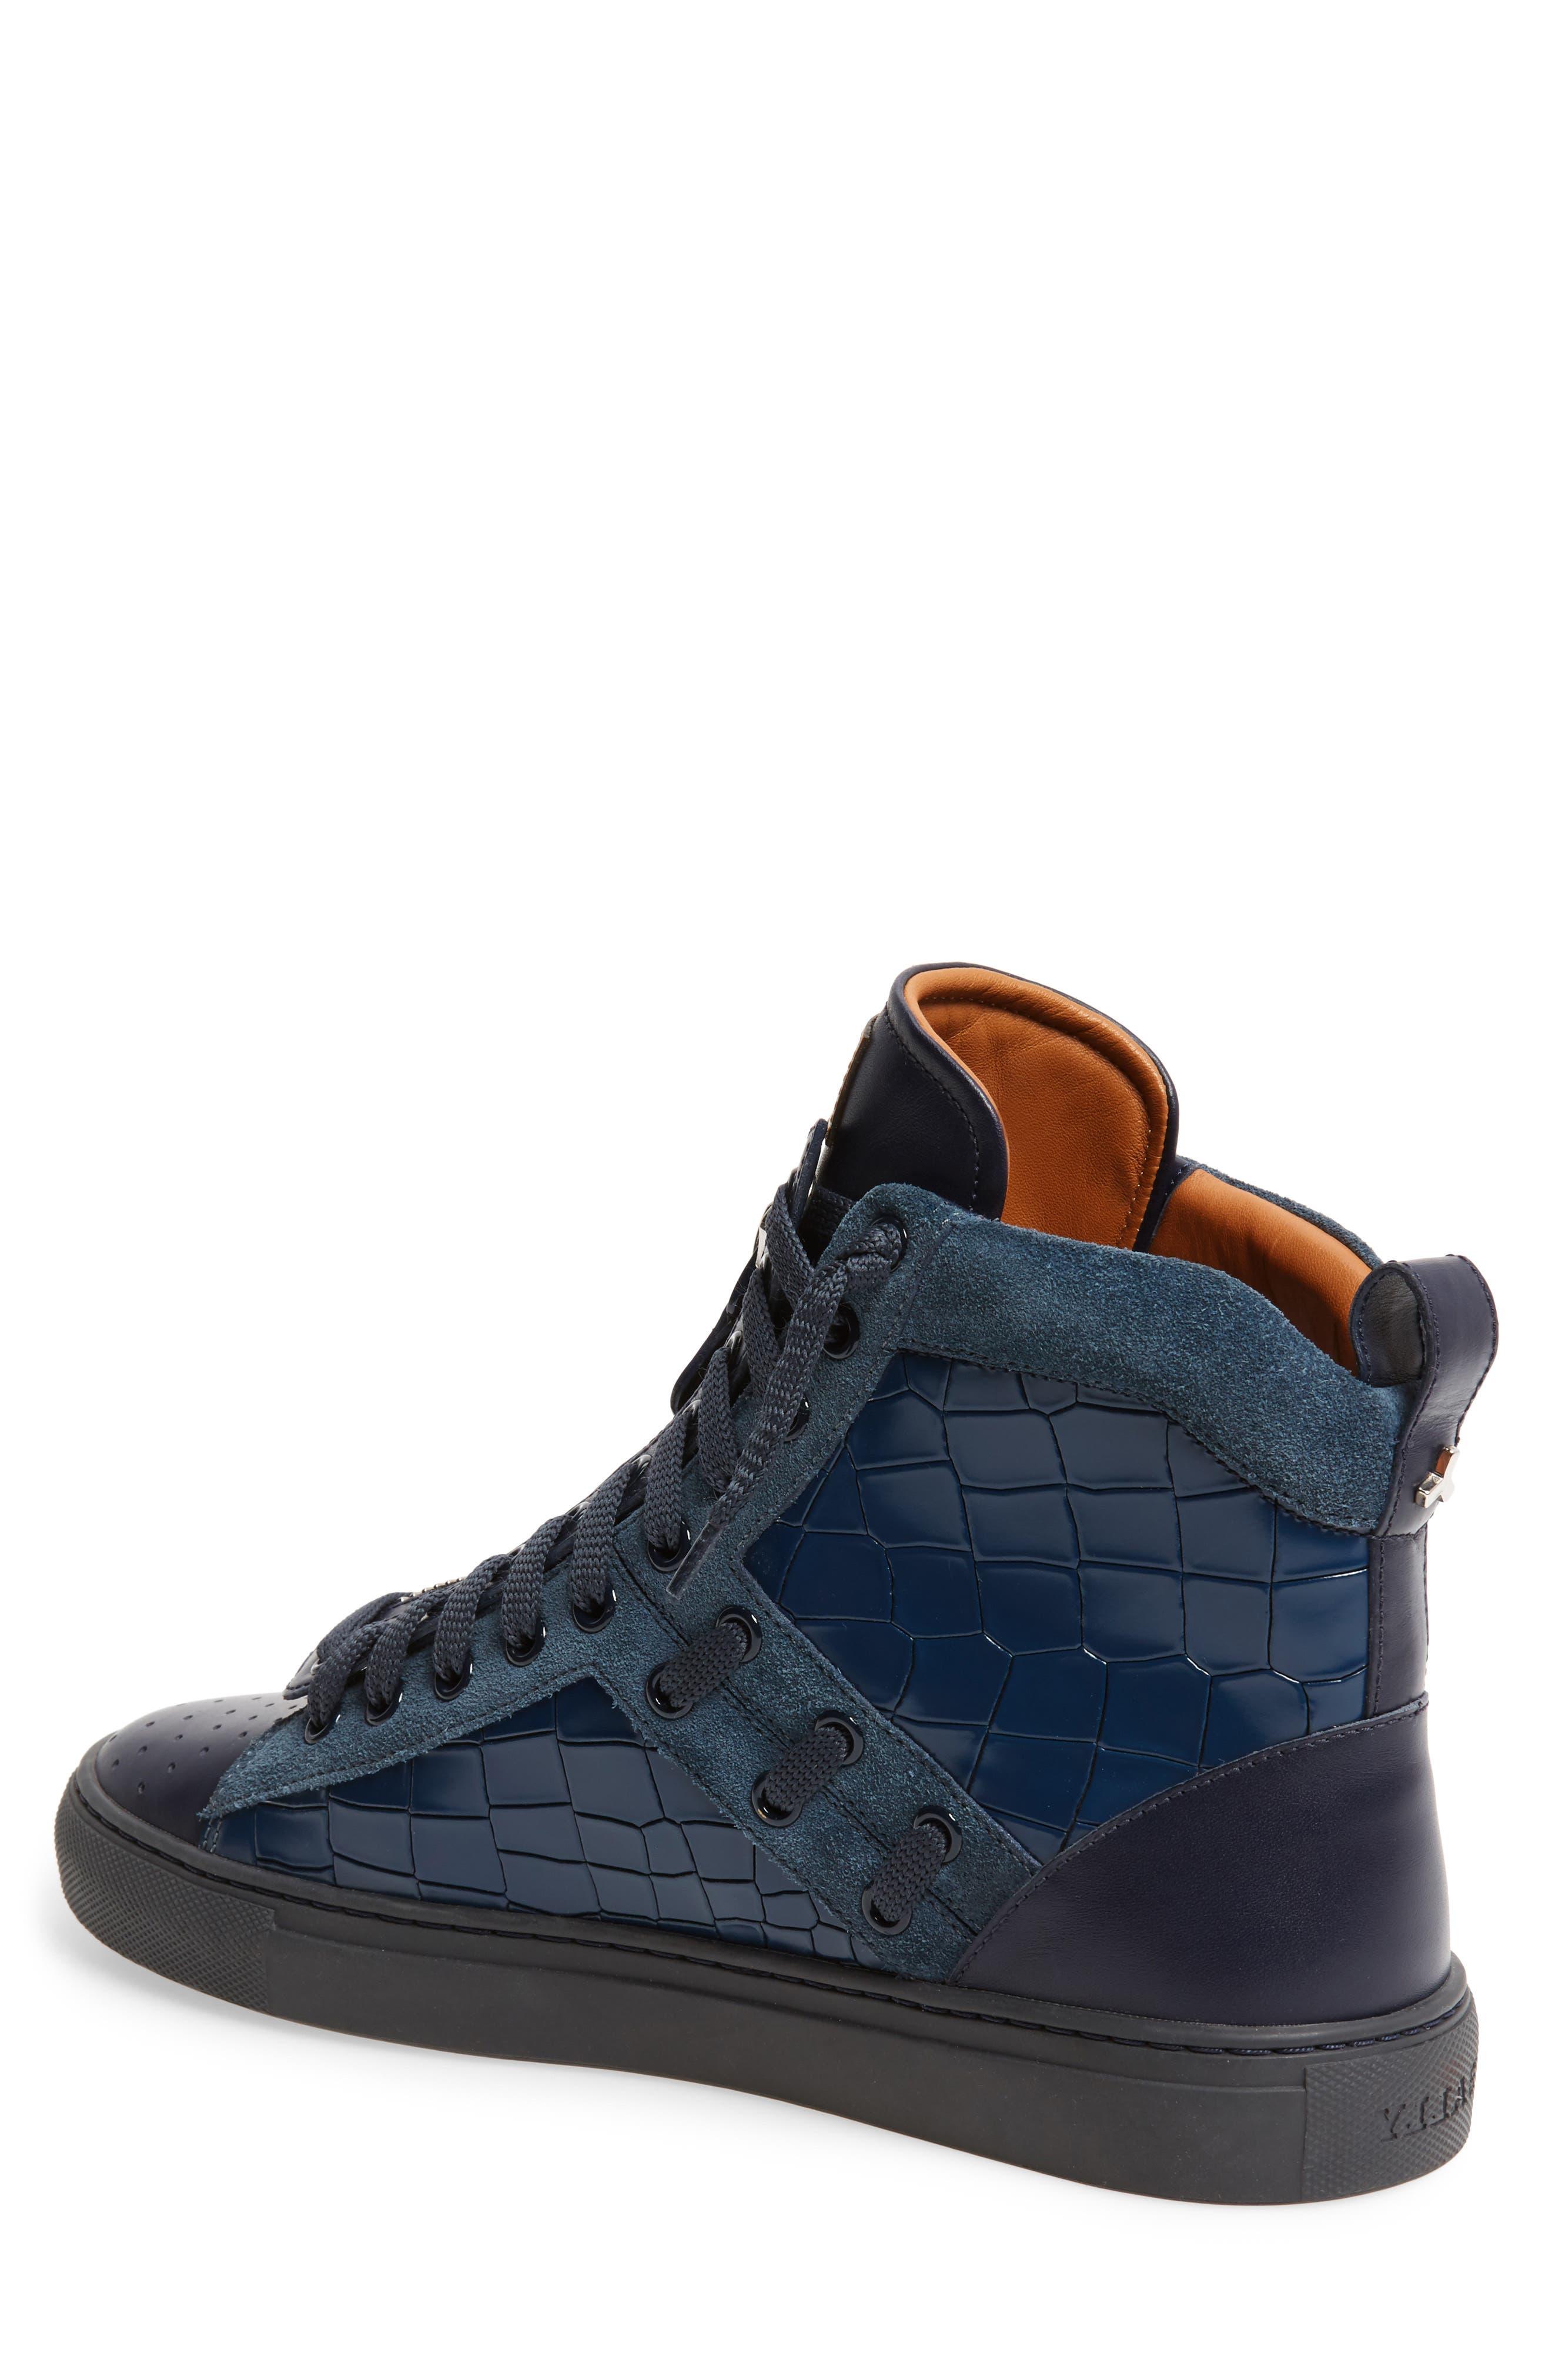 Hekem High-Top Sneaker,                             Alternate thumbnail 2, color,                             Ocean